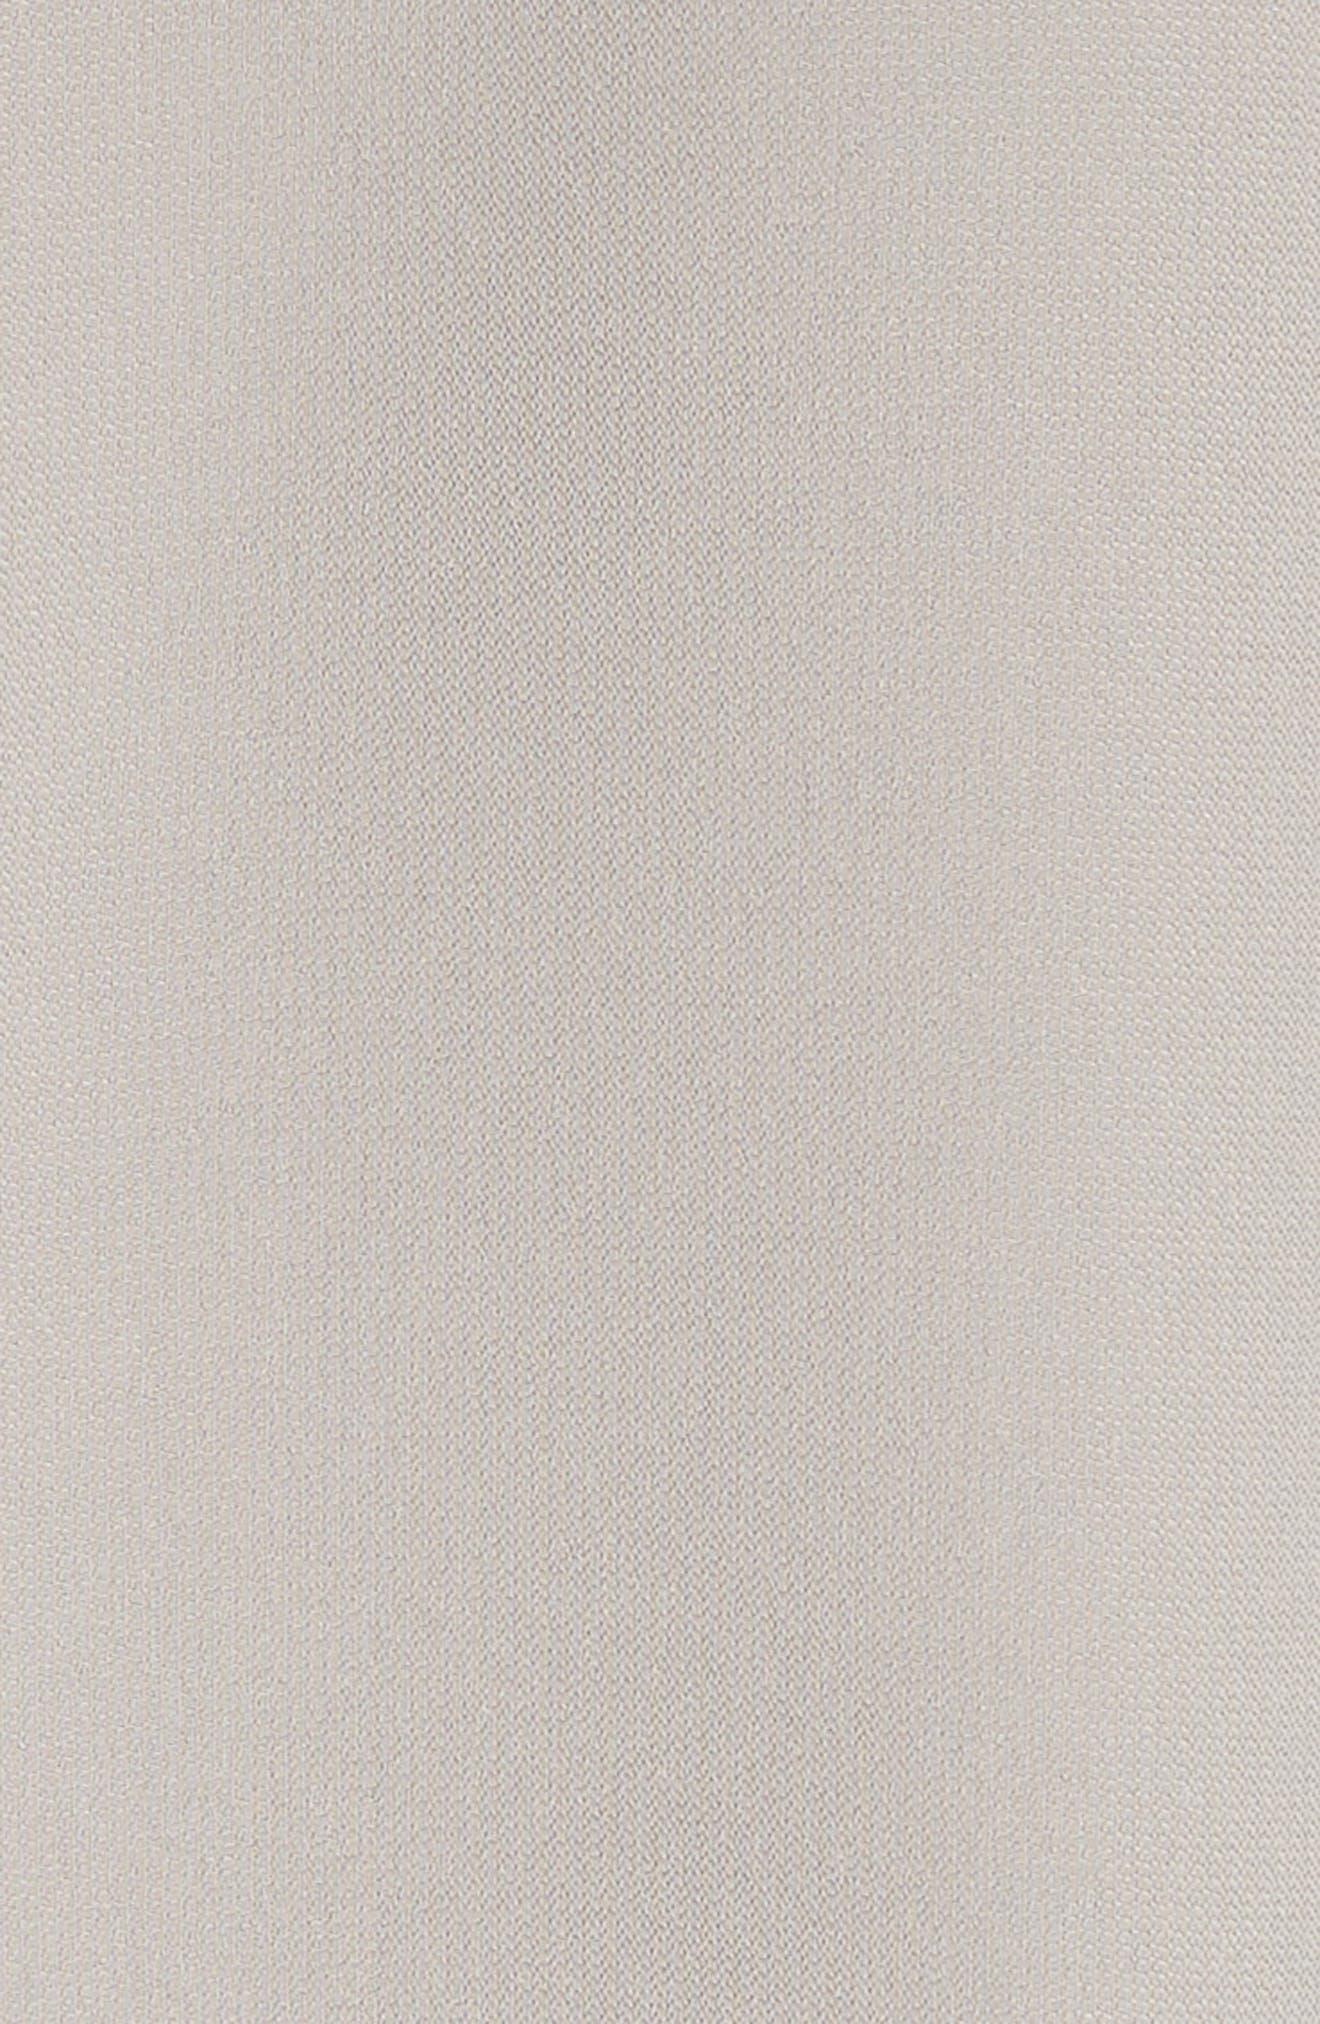 Dolman Sleeve Top,                             Alternate thumbnail 5, color,                             054